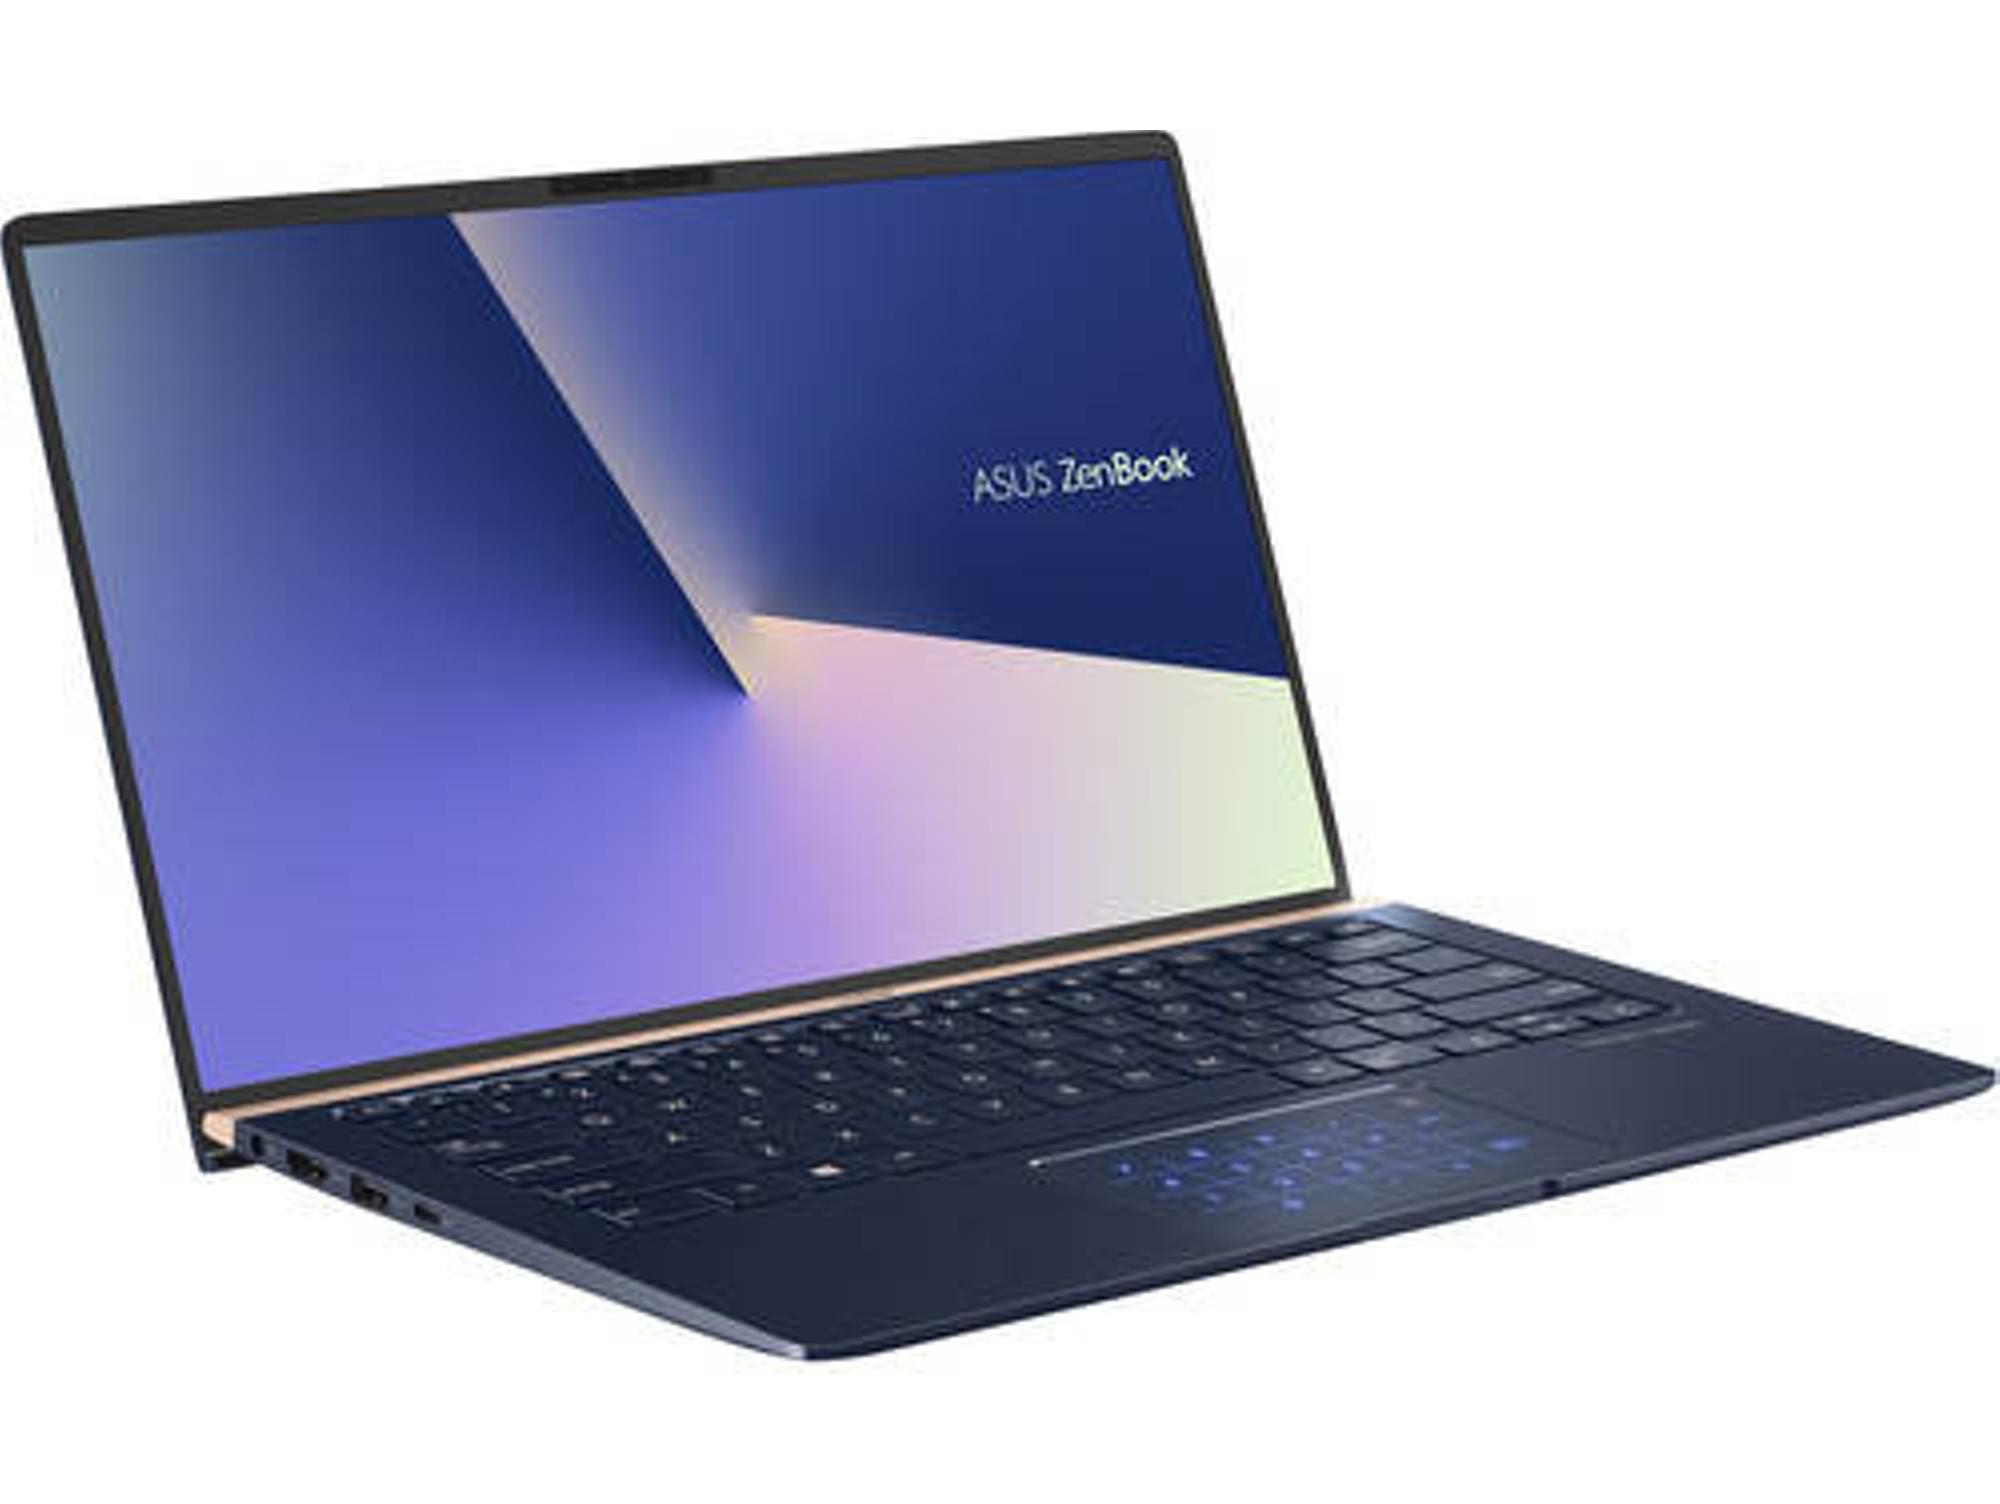 ASUS ZenBook 14 (i5-8265U, RAM: 8 GB, 256 GB SSD)